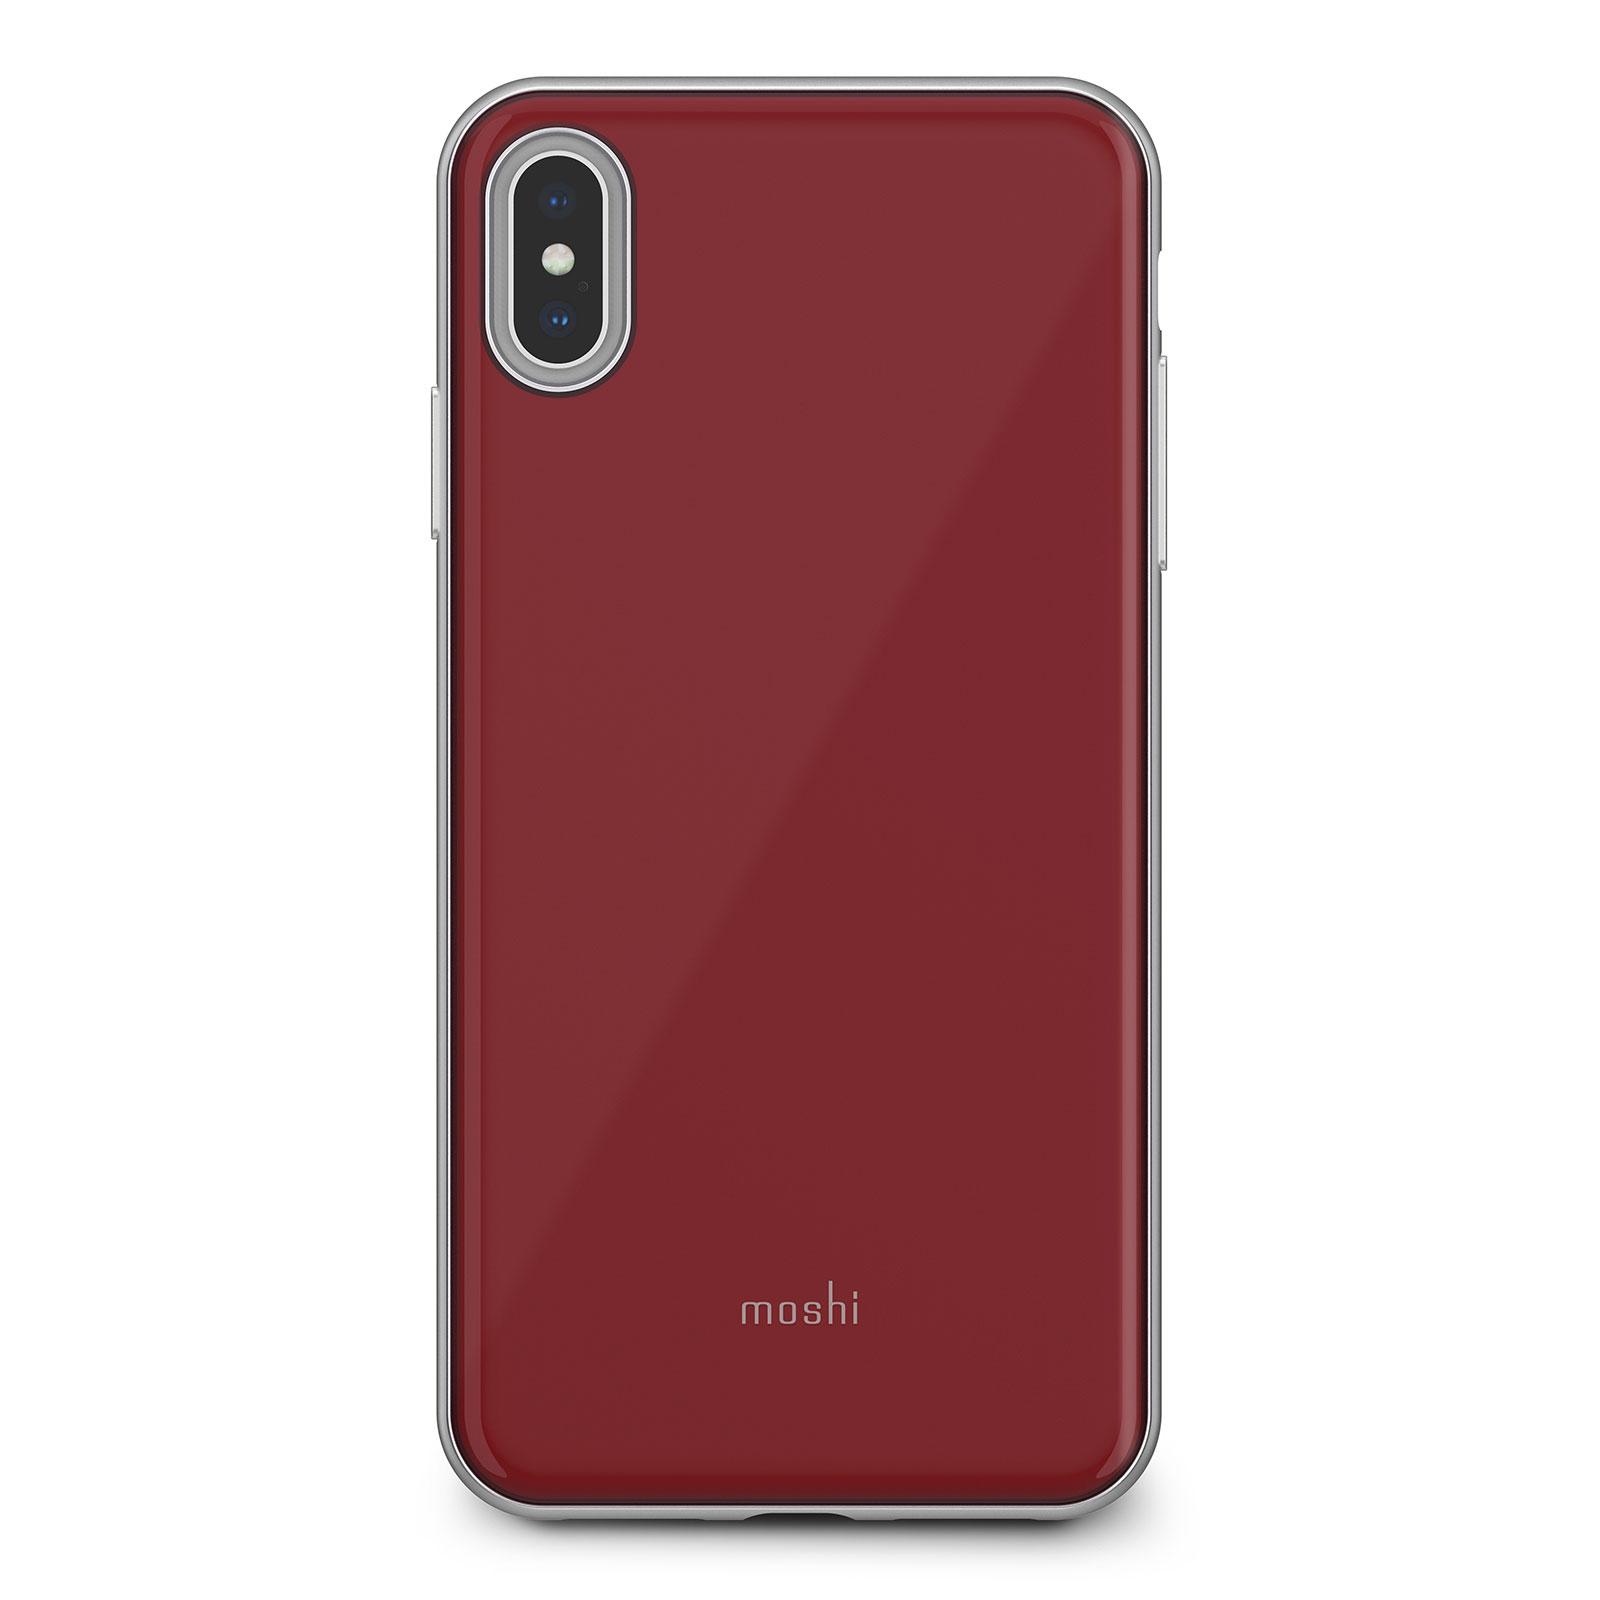 Клип-кейс Moshi iGlaze для iPhone XS Max Merlot Red накладка moshi iglaze для iphone xs max чёрный 99mo113002